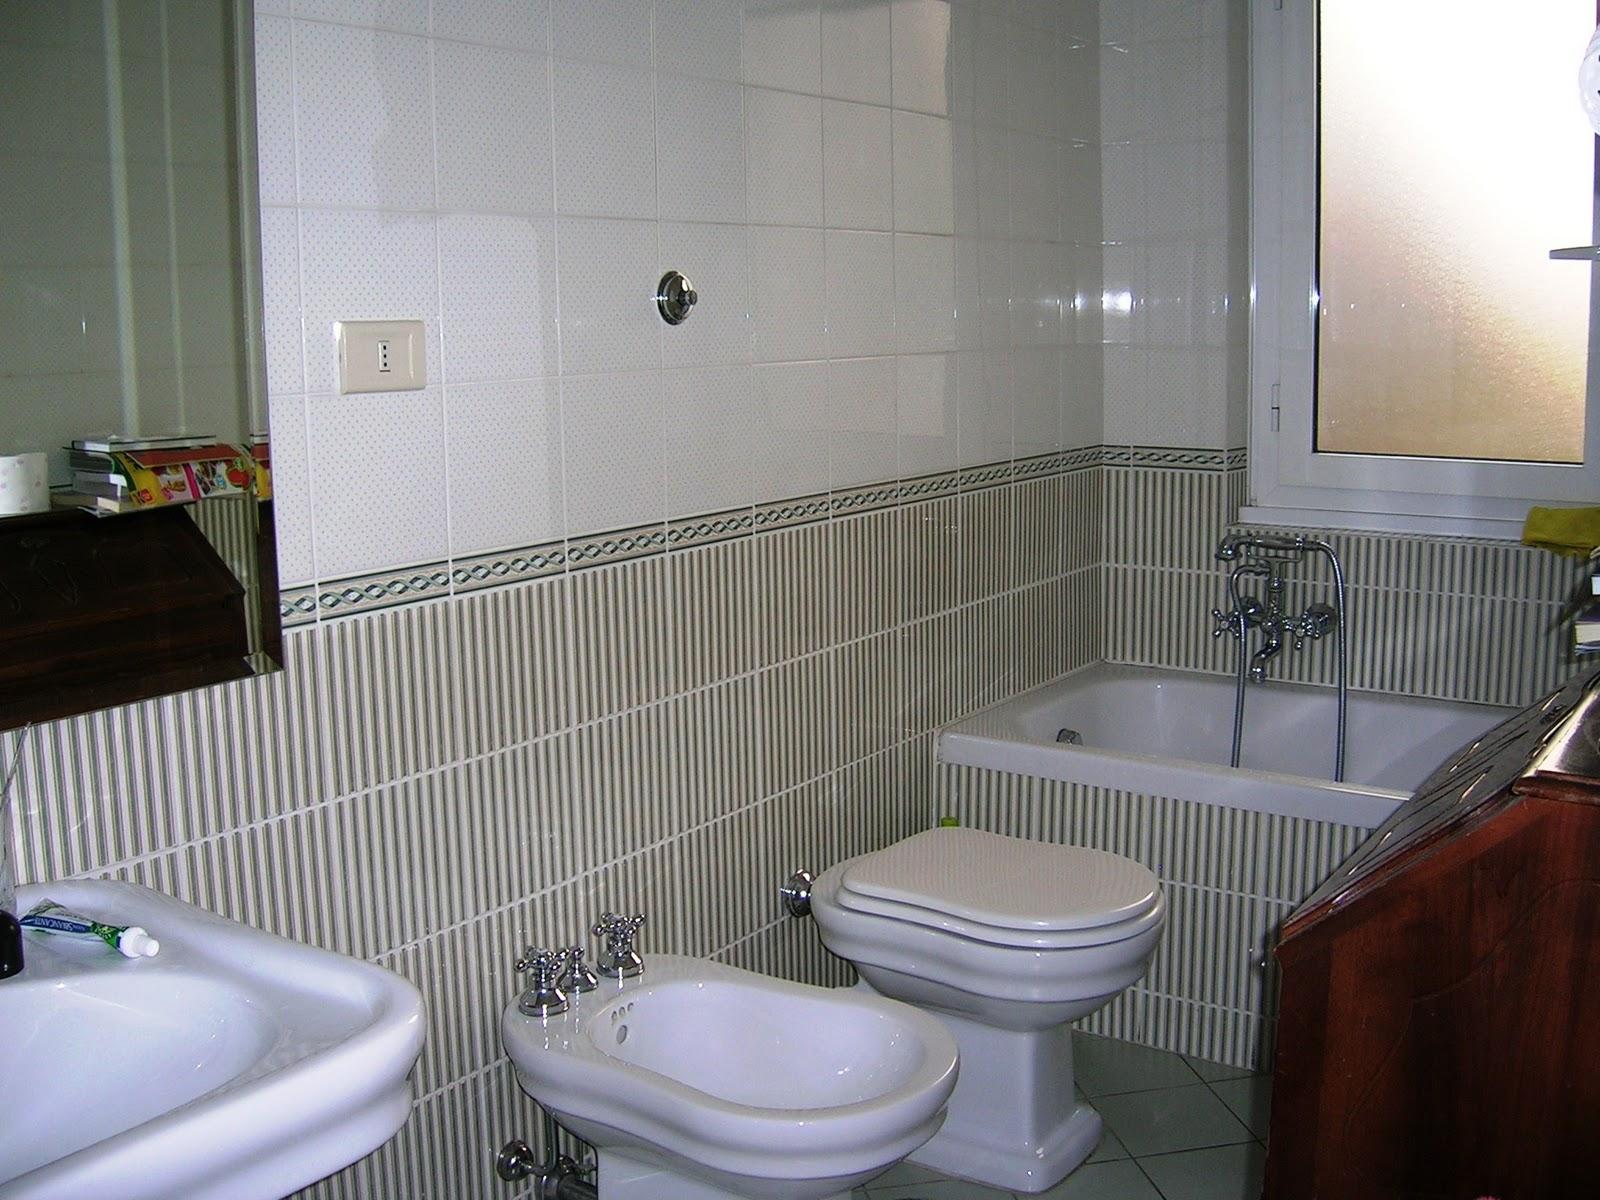 Bagno ispirazioni ideas vasche da - Vasca da bagno piccola ...